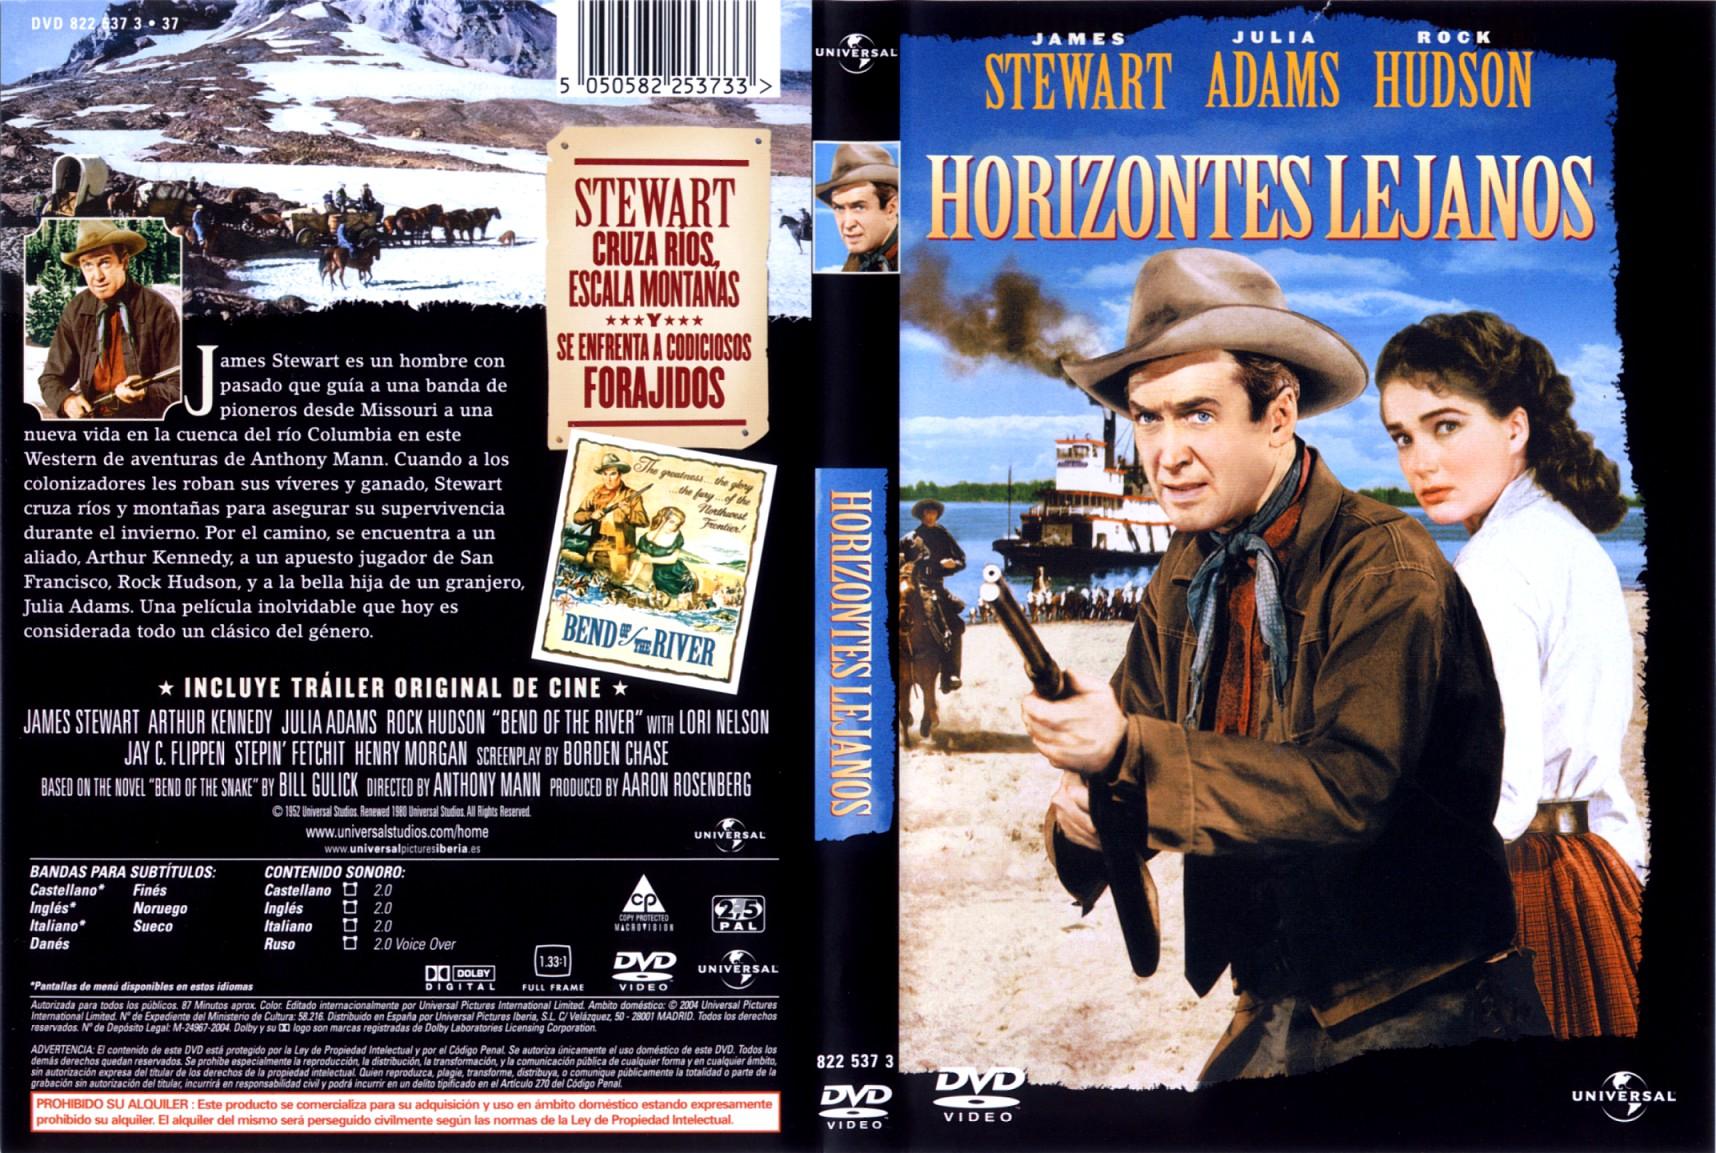 b0ad0_Horizontes_lejanos_DVD.jpg